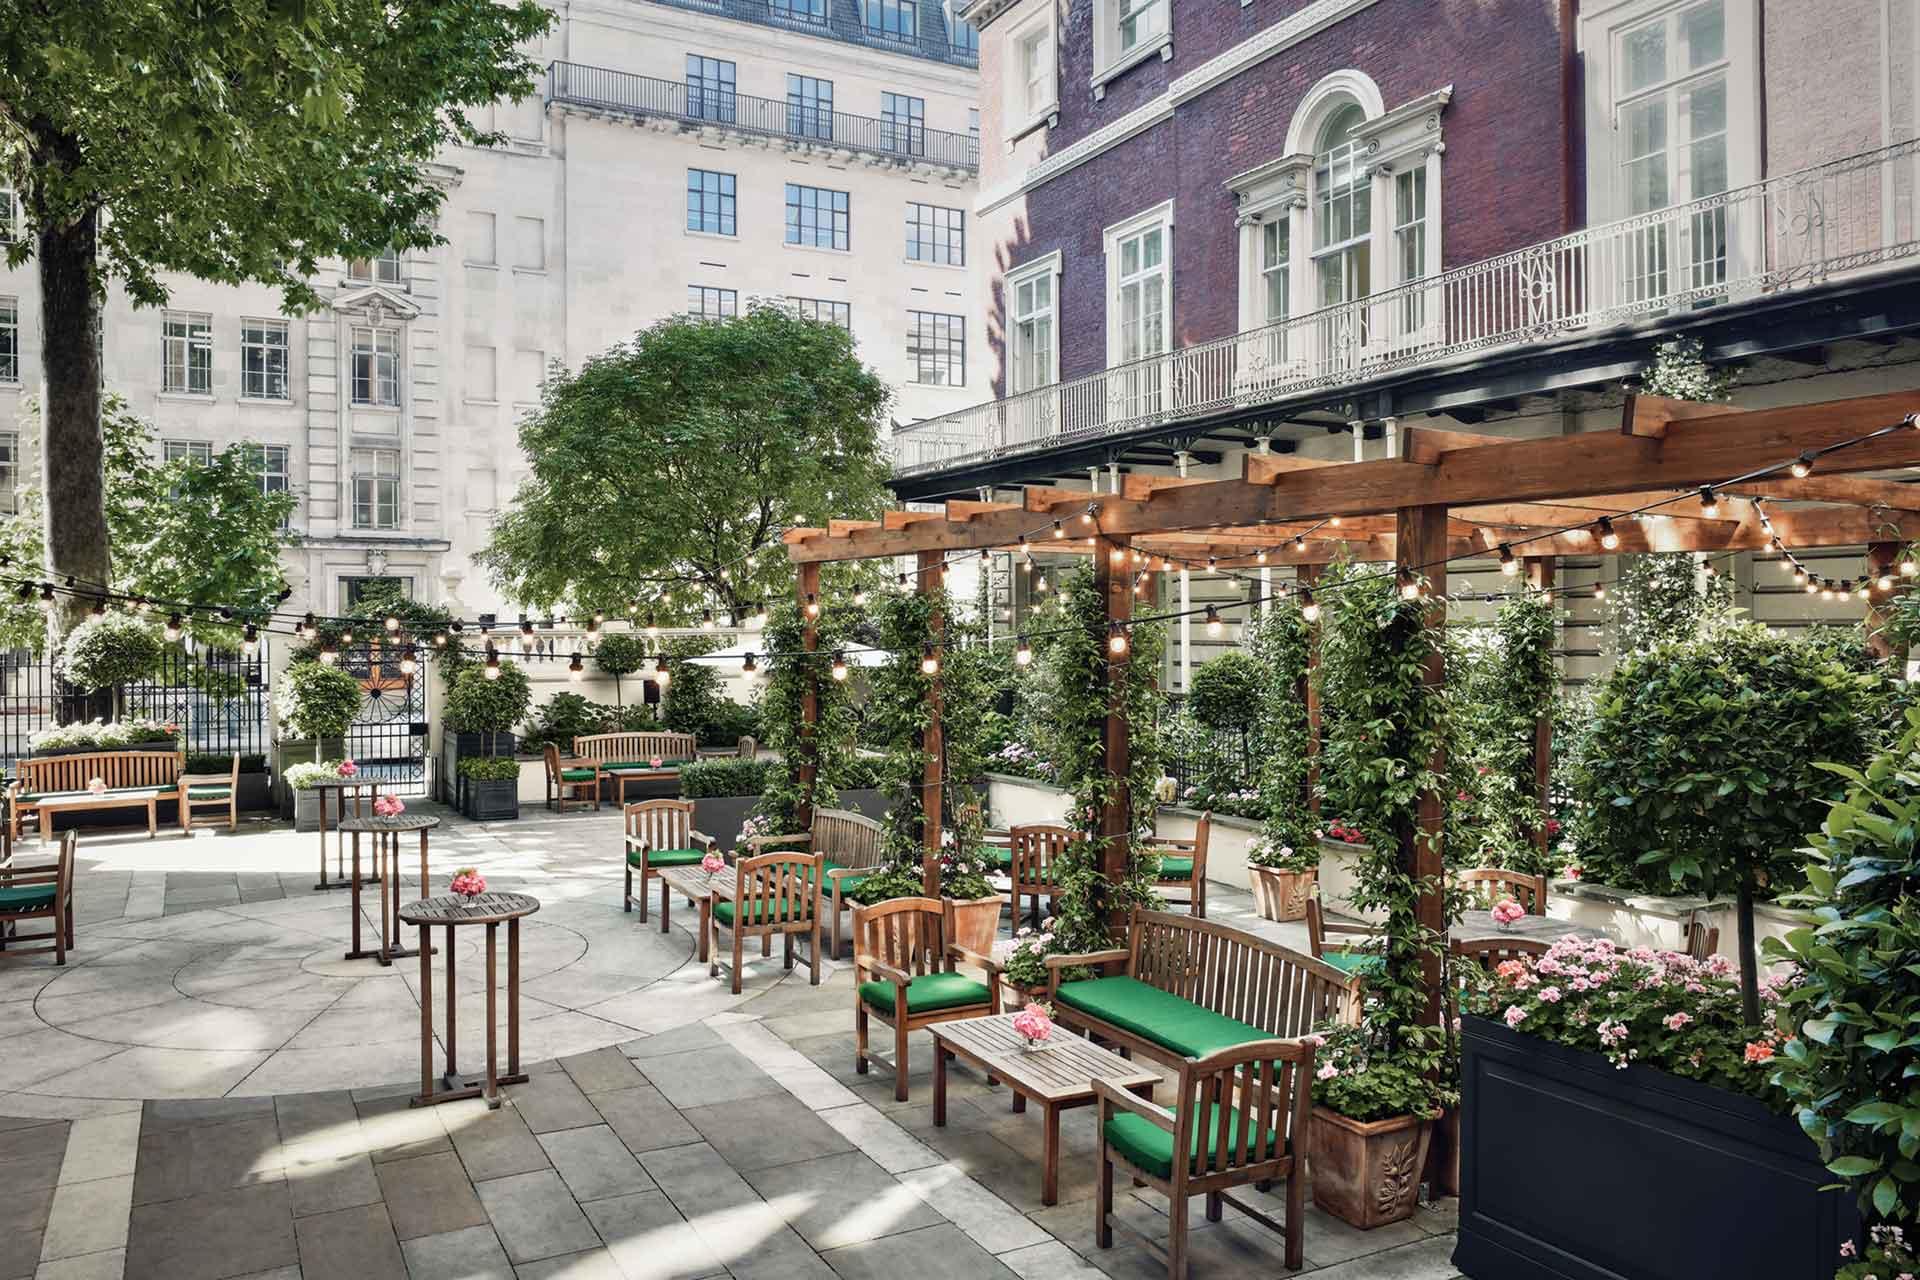 The-Langham courtyard